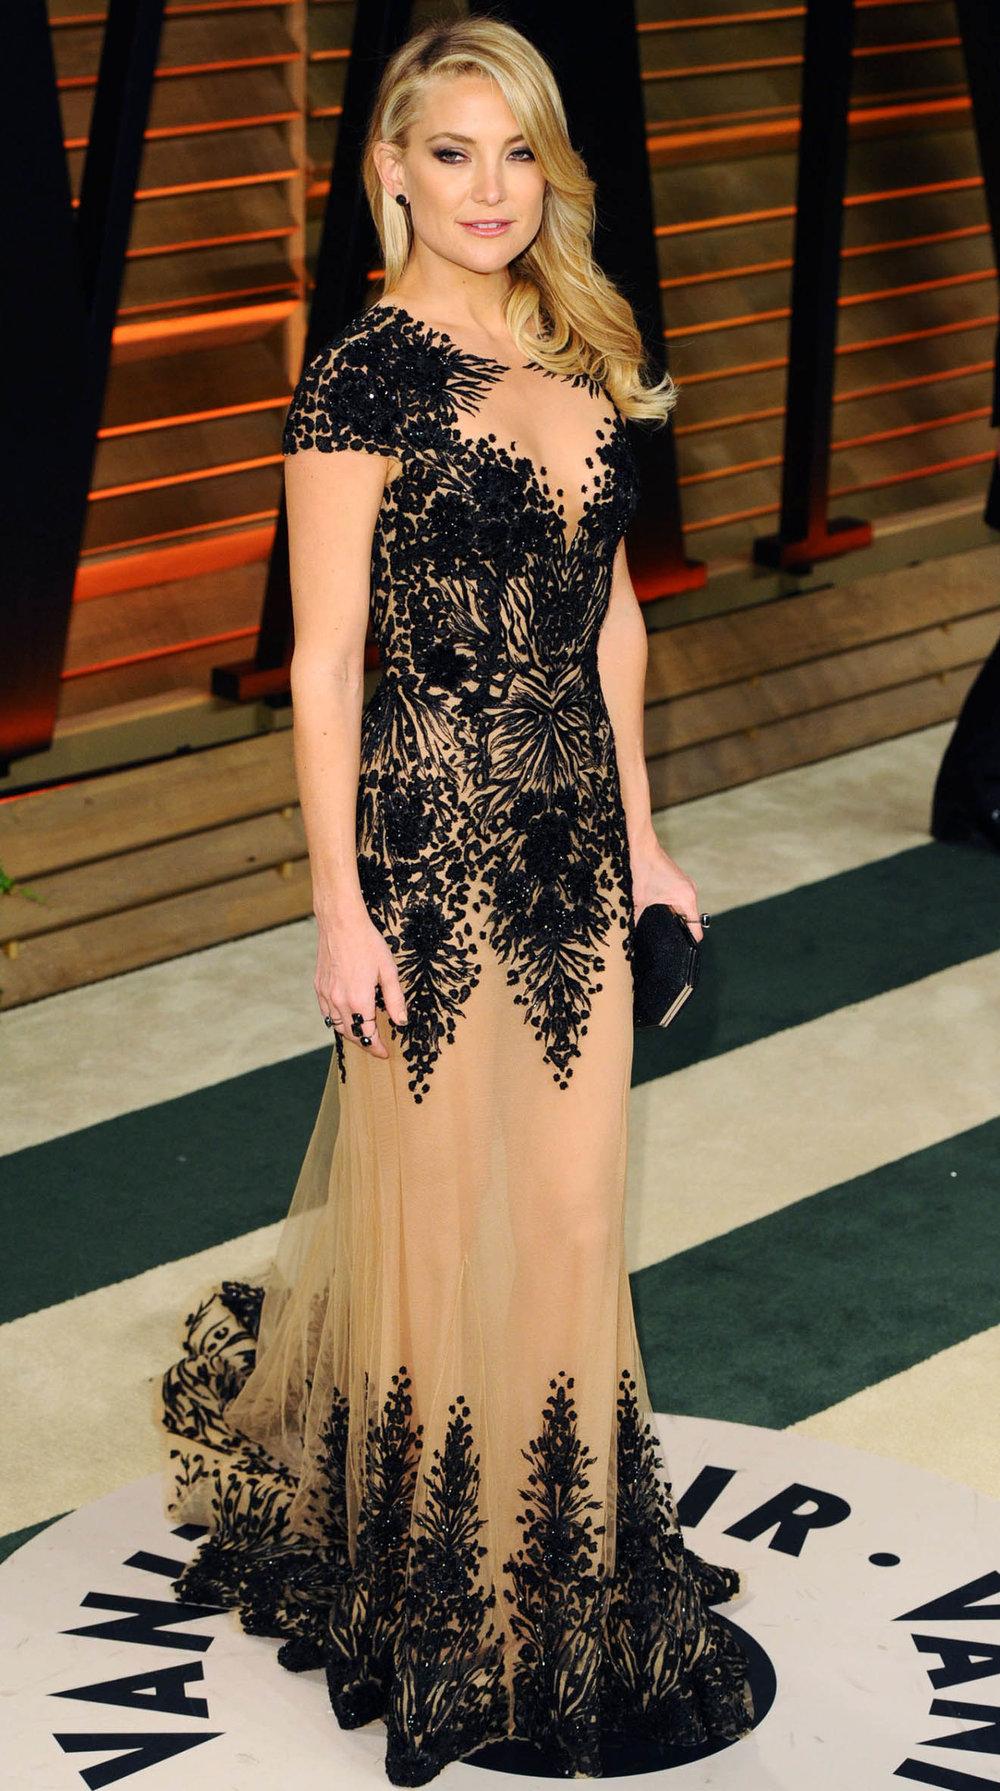 elegant-bohemian-style-type-katehudson-nudeandblack-dress-lace-redcarpet.jpg